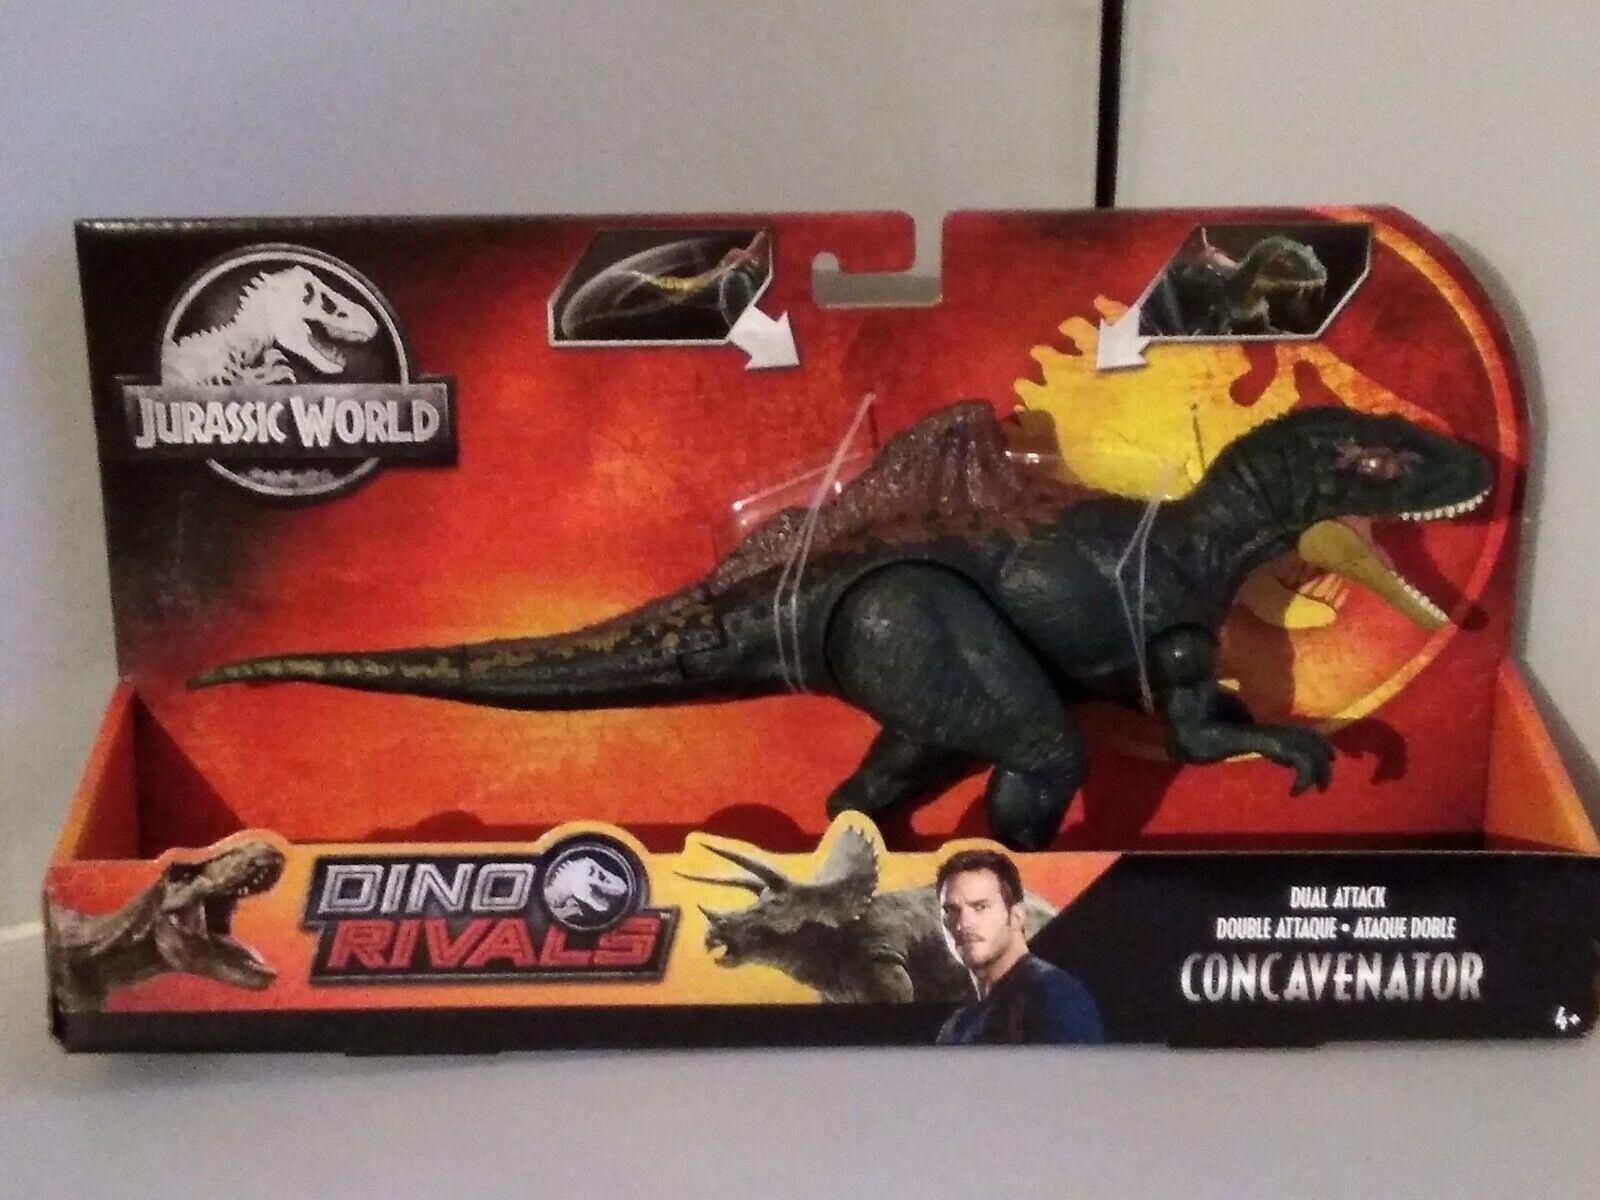 Jurassic World Dual Attack Dino Rivals Concavenator Dinosaur Figure BRAND NEW